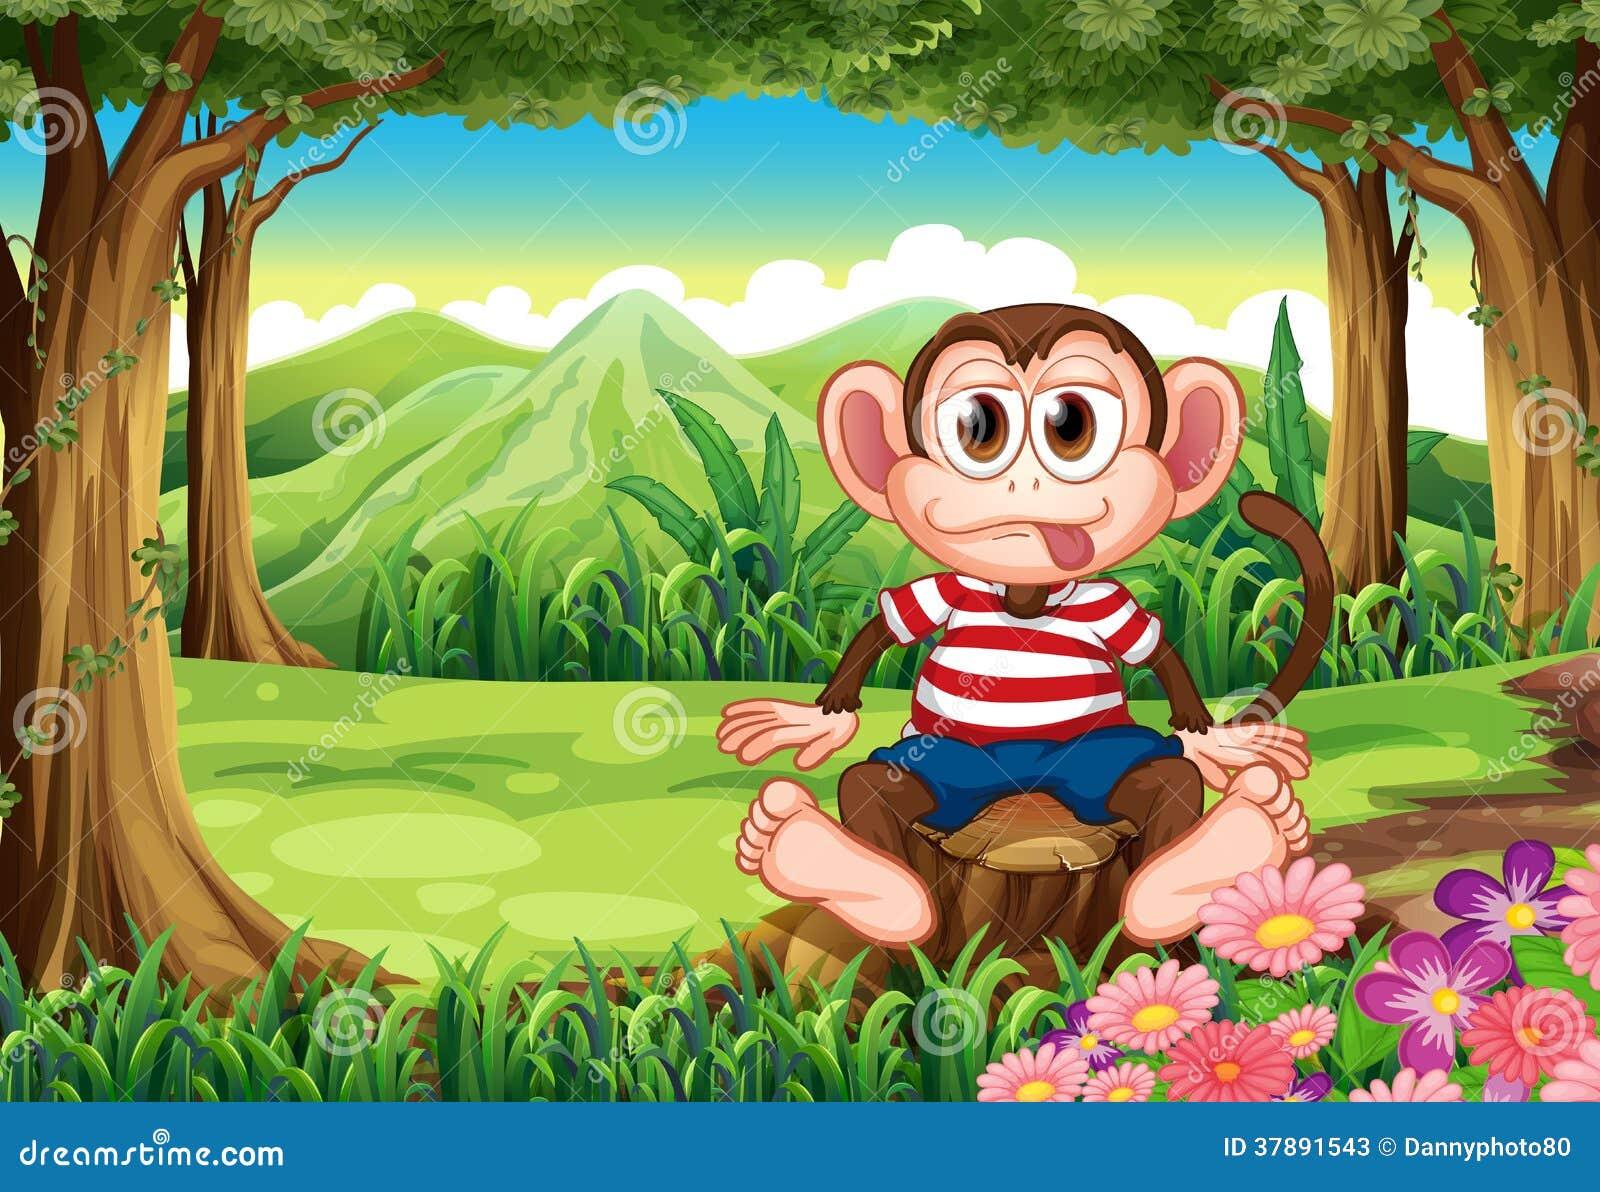 A boastful monkey sitting above the stump